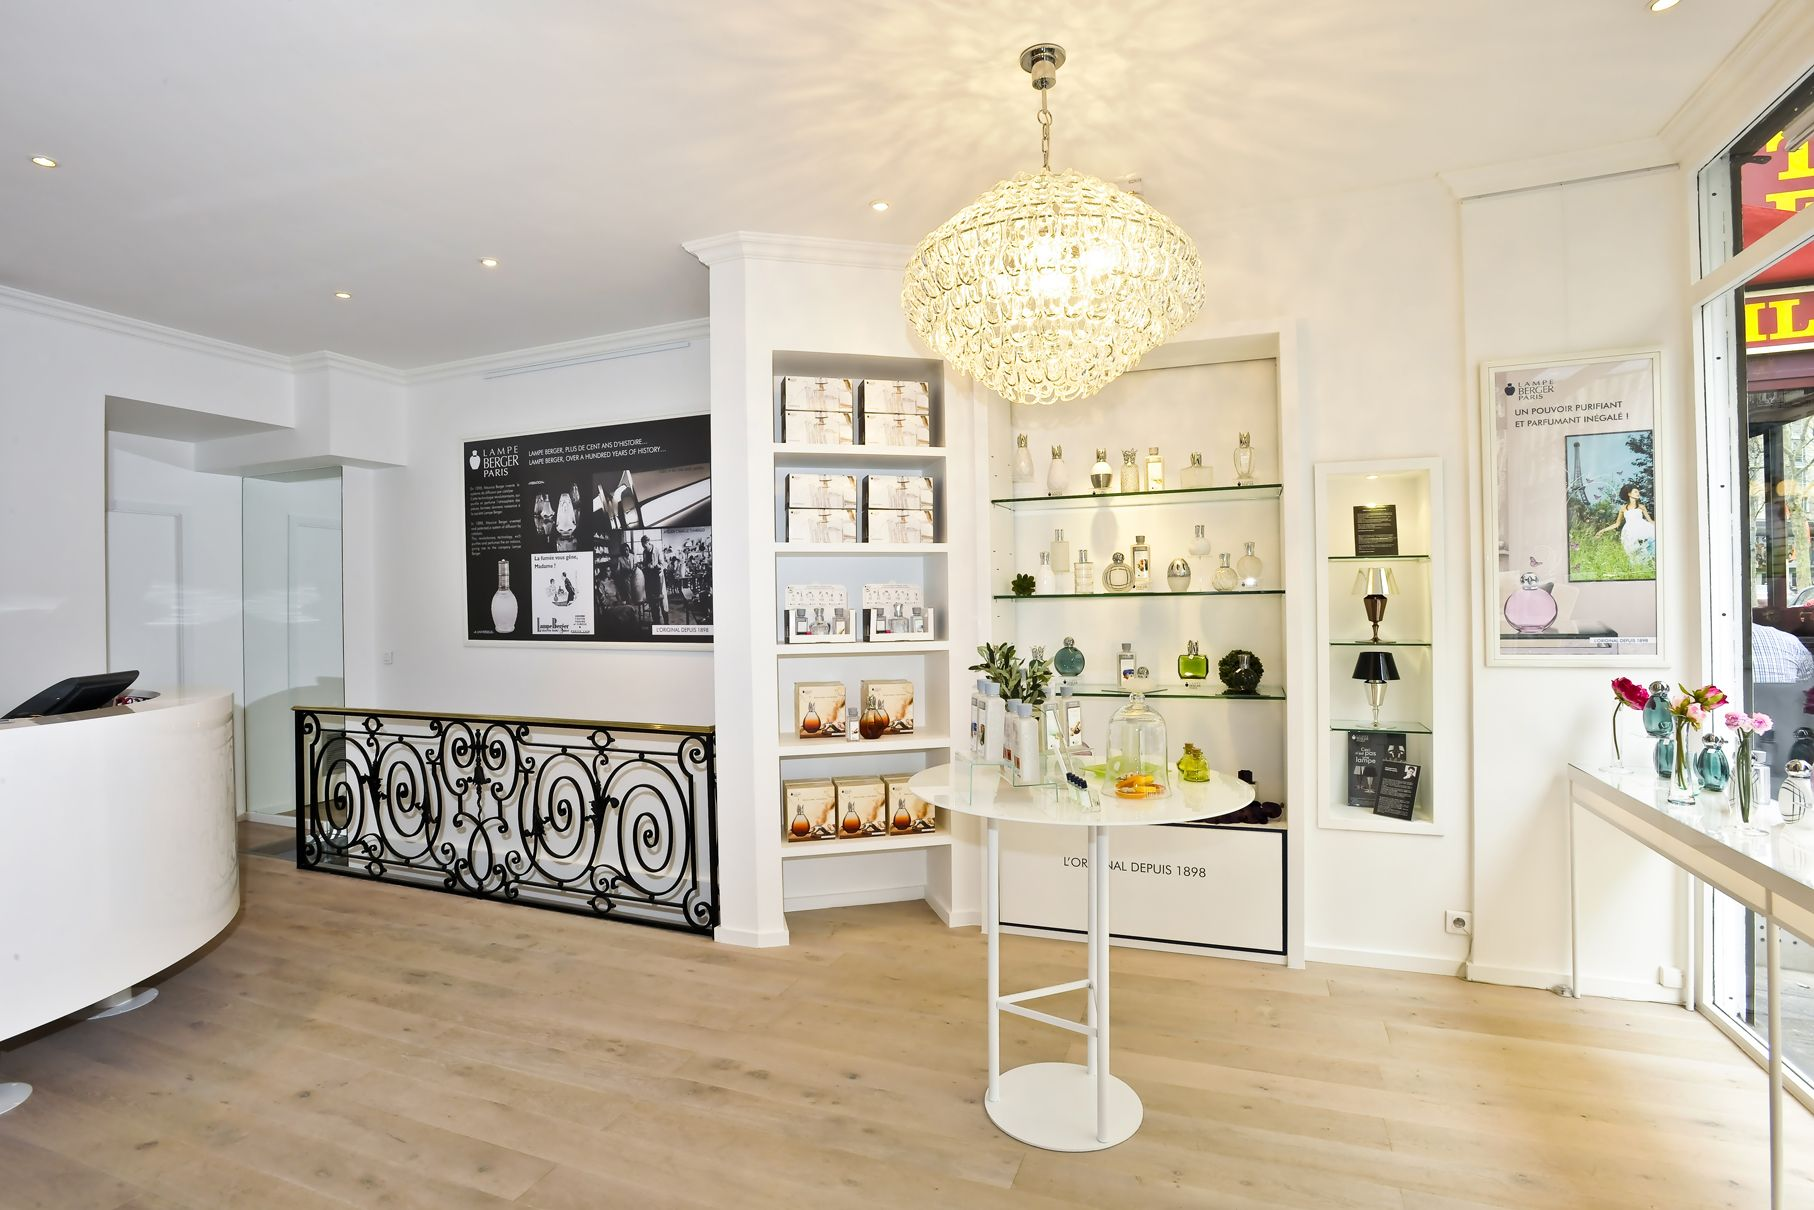 lampe berger boutique in paris rue de marignan inspiration pinterest. Black Bedroom Furniture Sets. Home Design Ideas